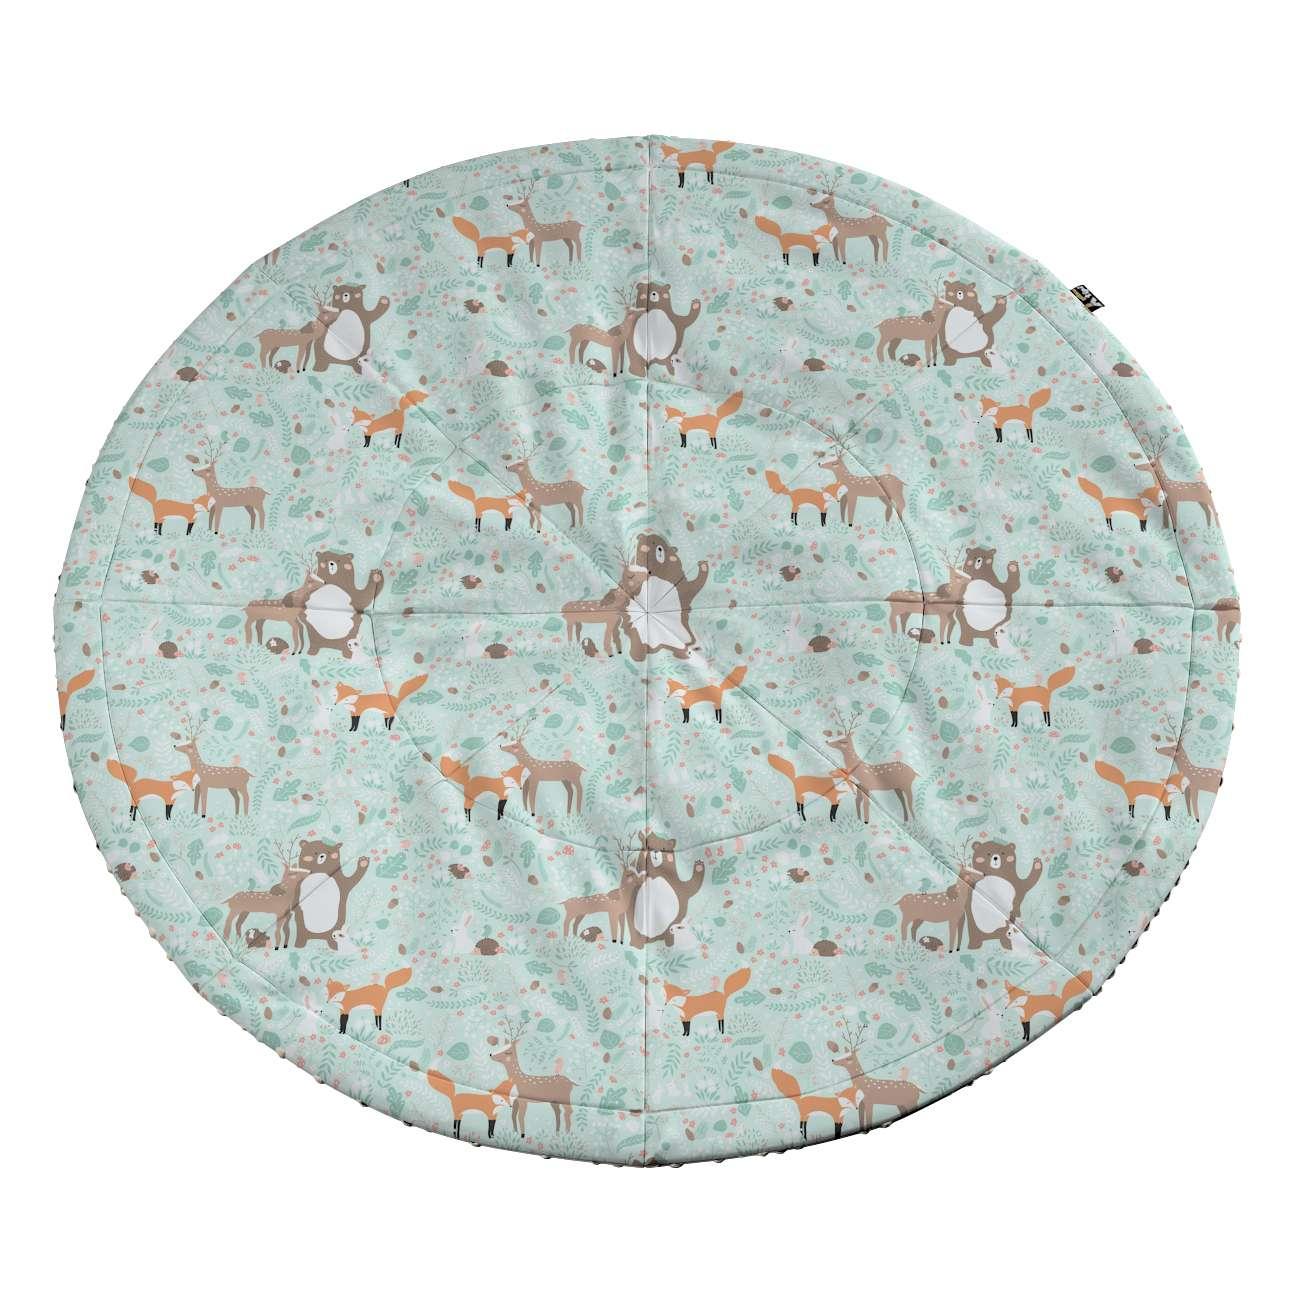 Apvalus kilimėlis kolekcijoje Magic Collection, audinys: 500-15